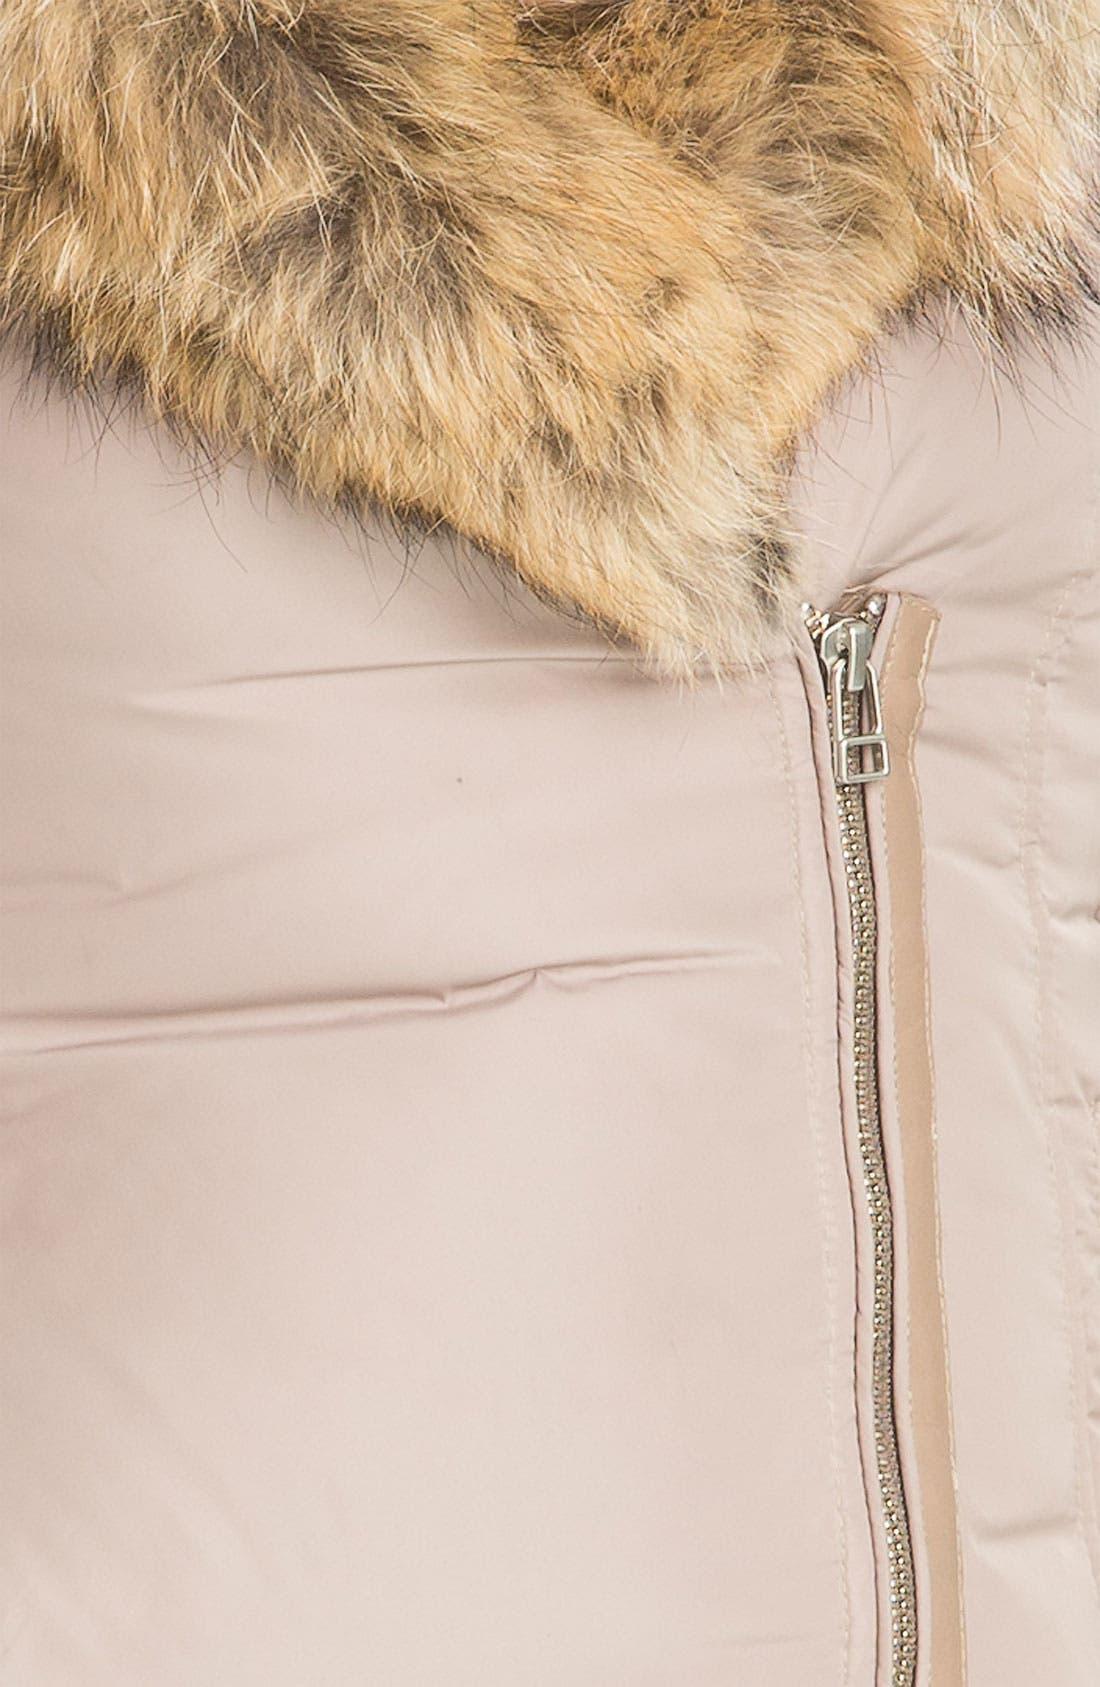 MACKAGE,                             'Akiva' Genuine Fox & Rabbit Fur Trim Down Coat,                             Alternate thumbnail 2, color,                             250